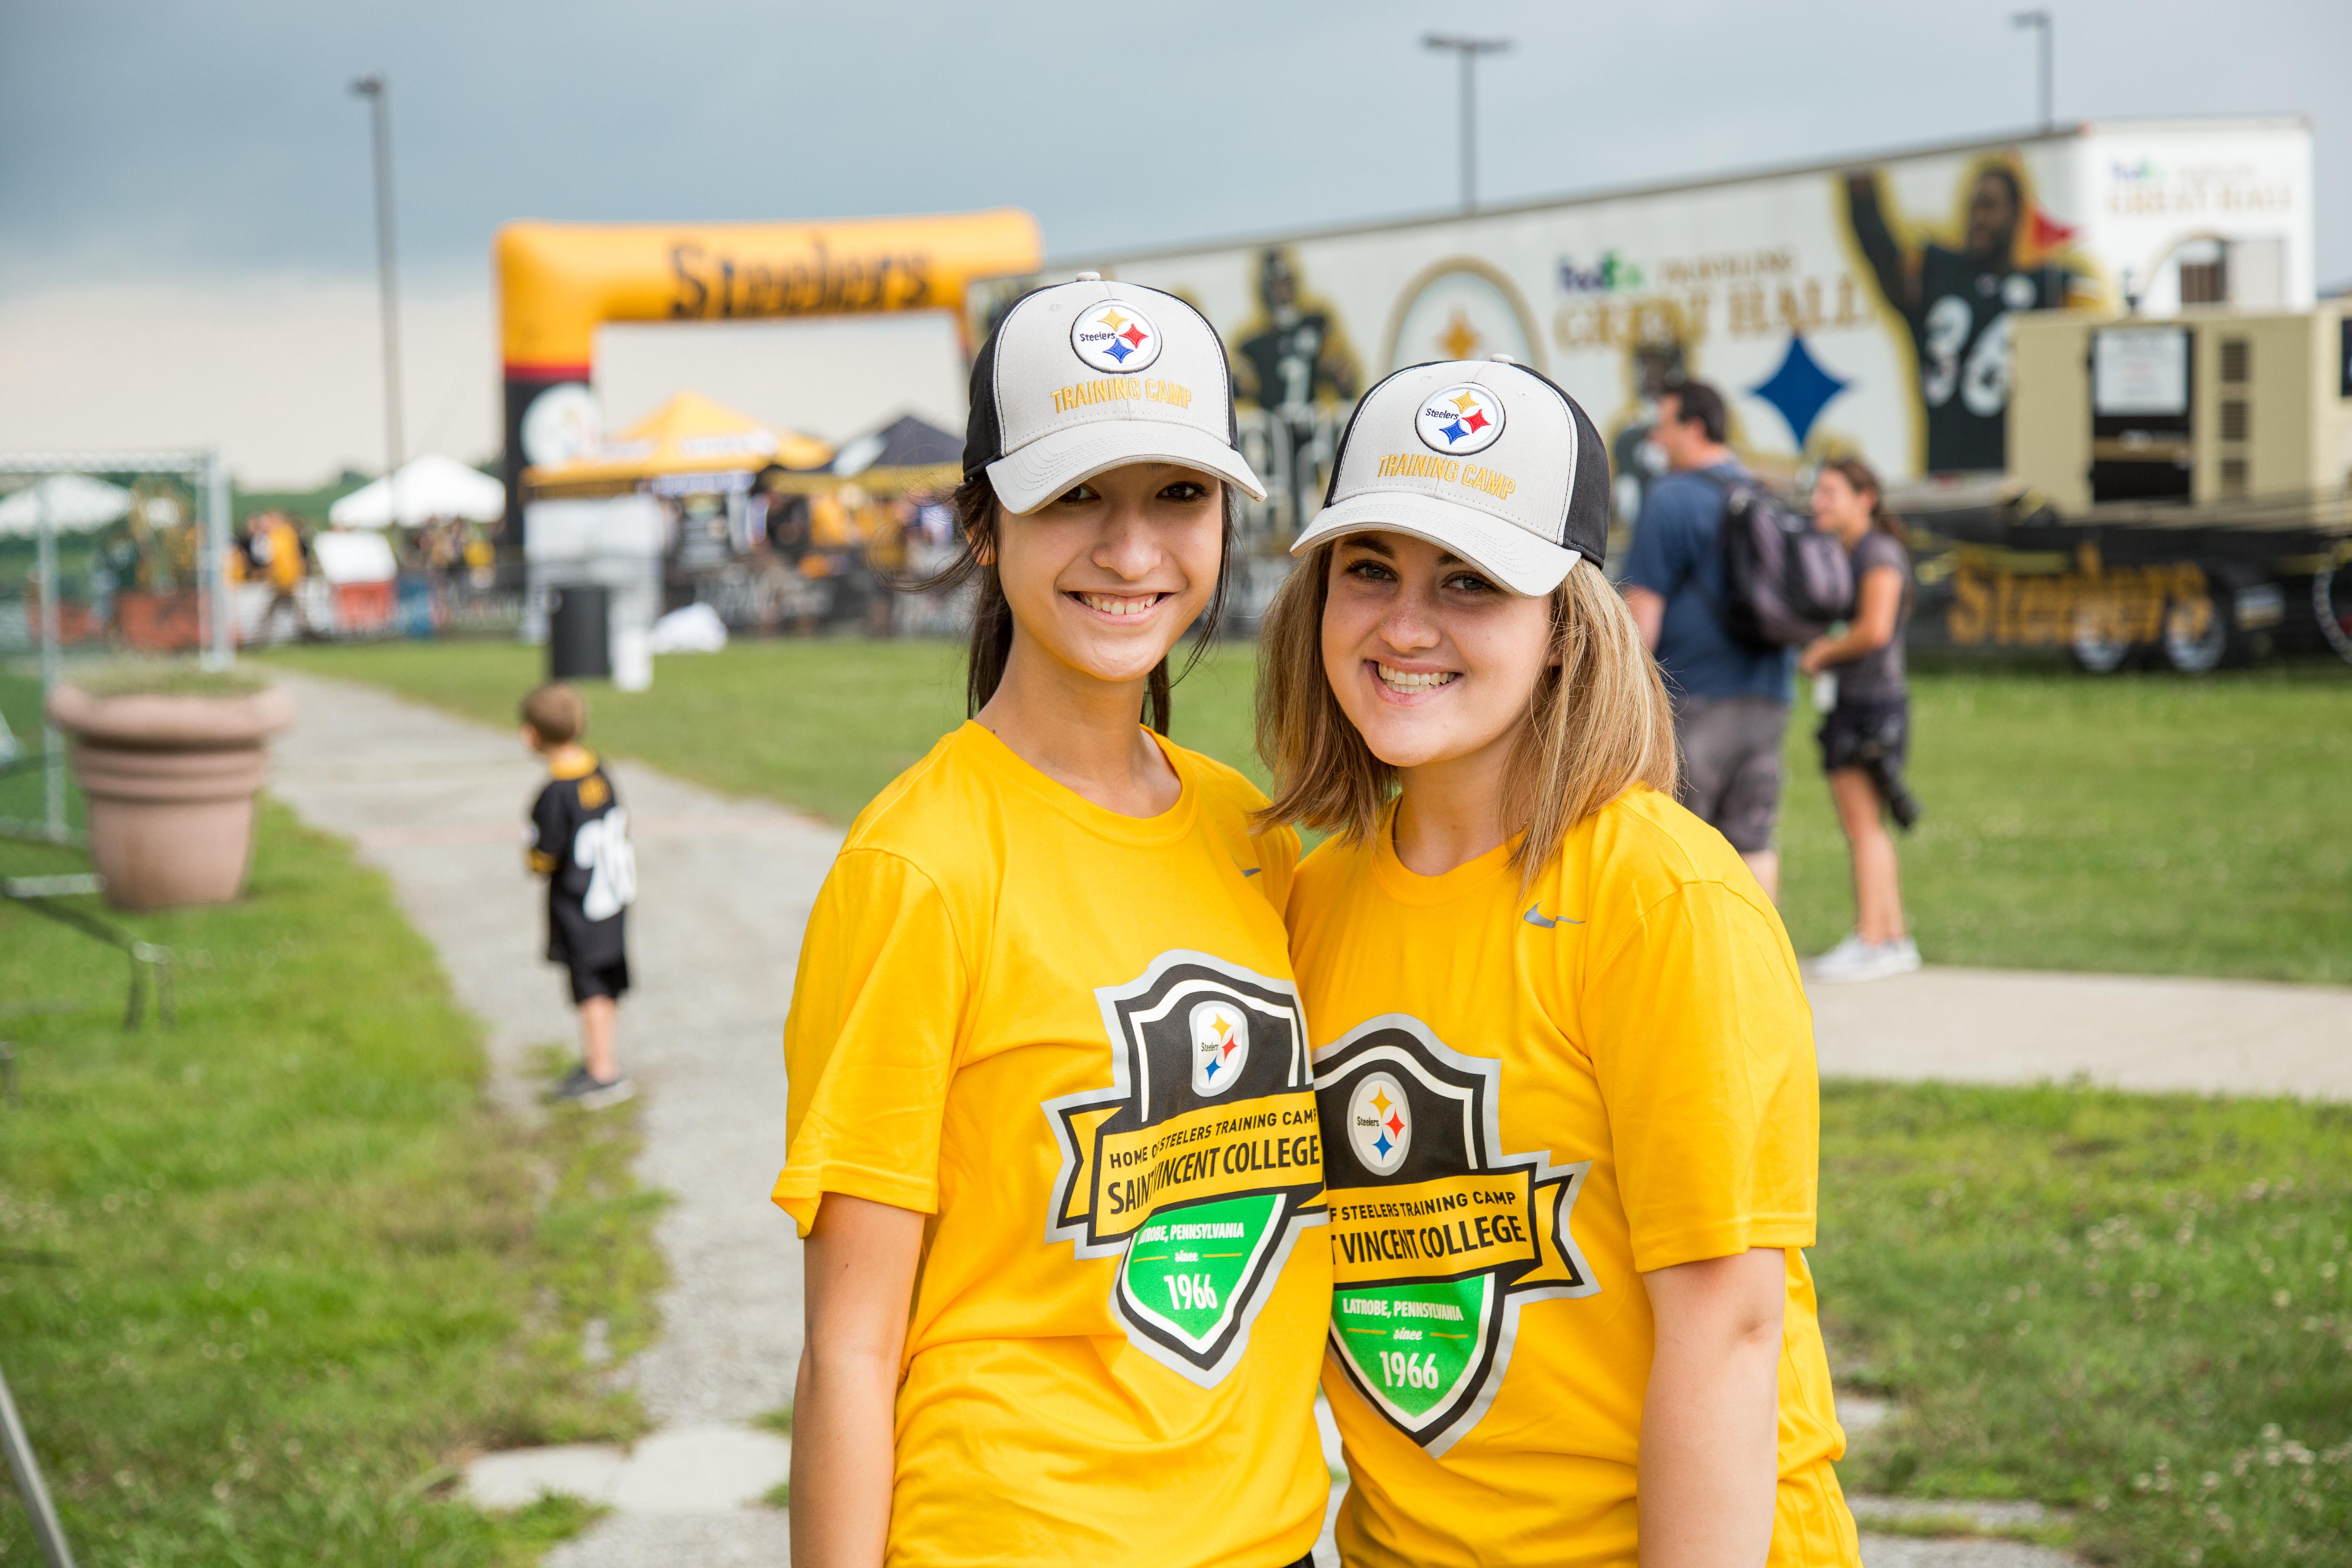 2017-7-28 Steelers Training Camp-23.jpg